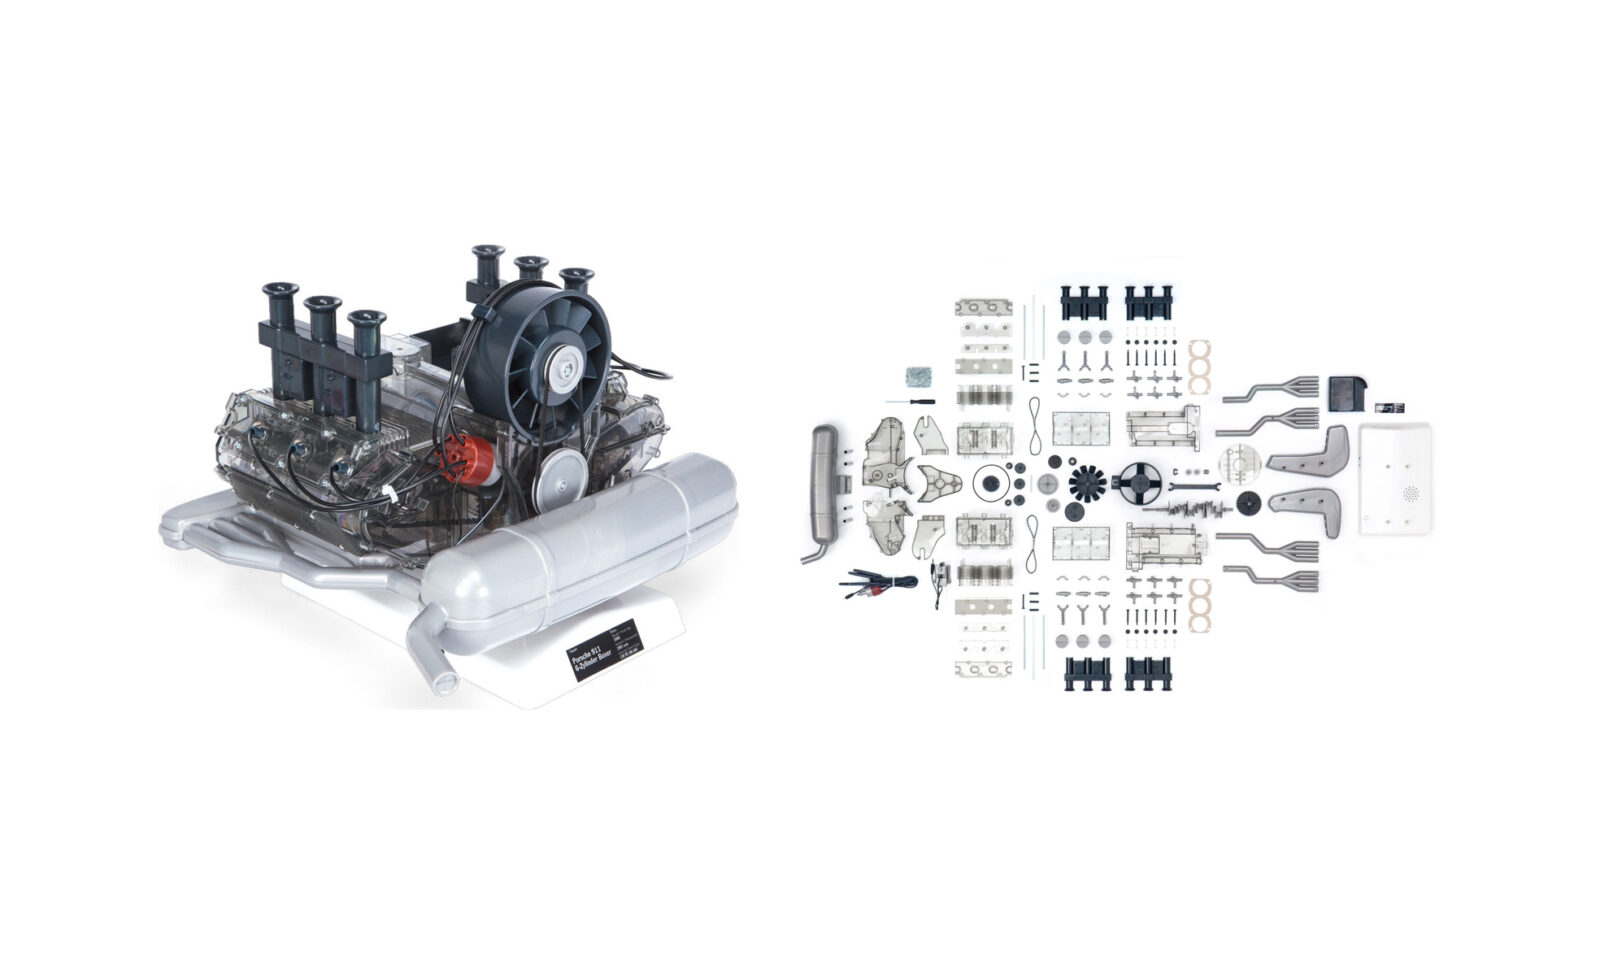 Porsche Flat 6 Engine 1 4 Scale Model